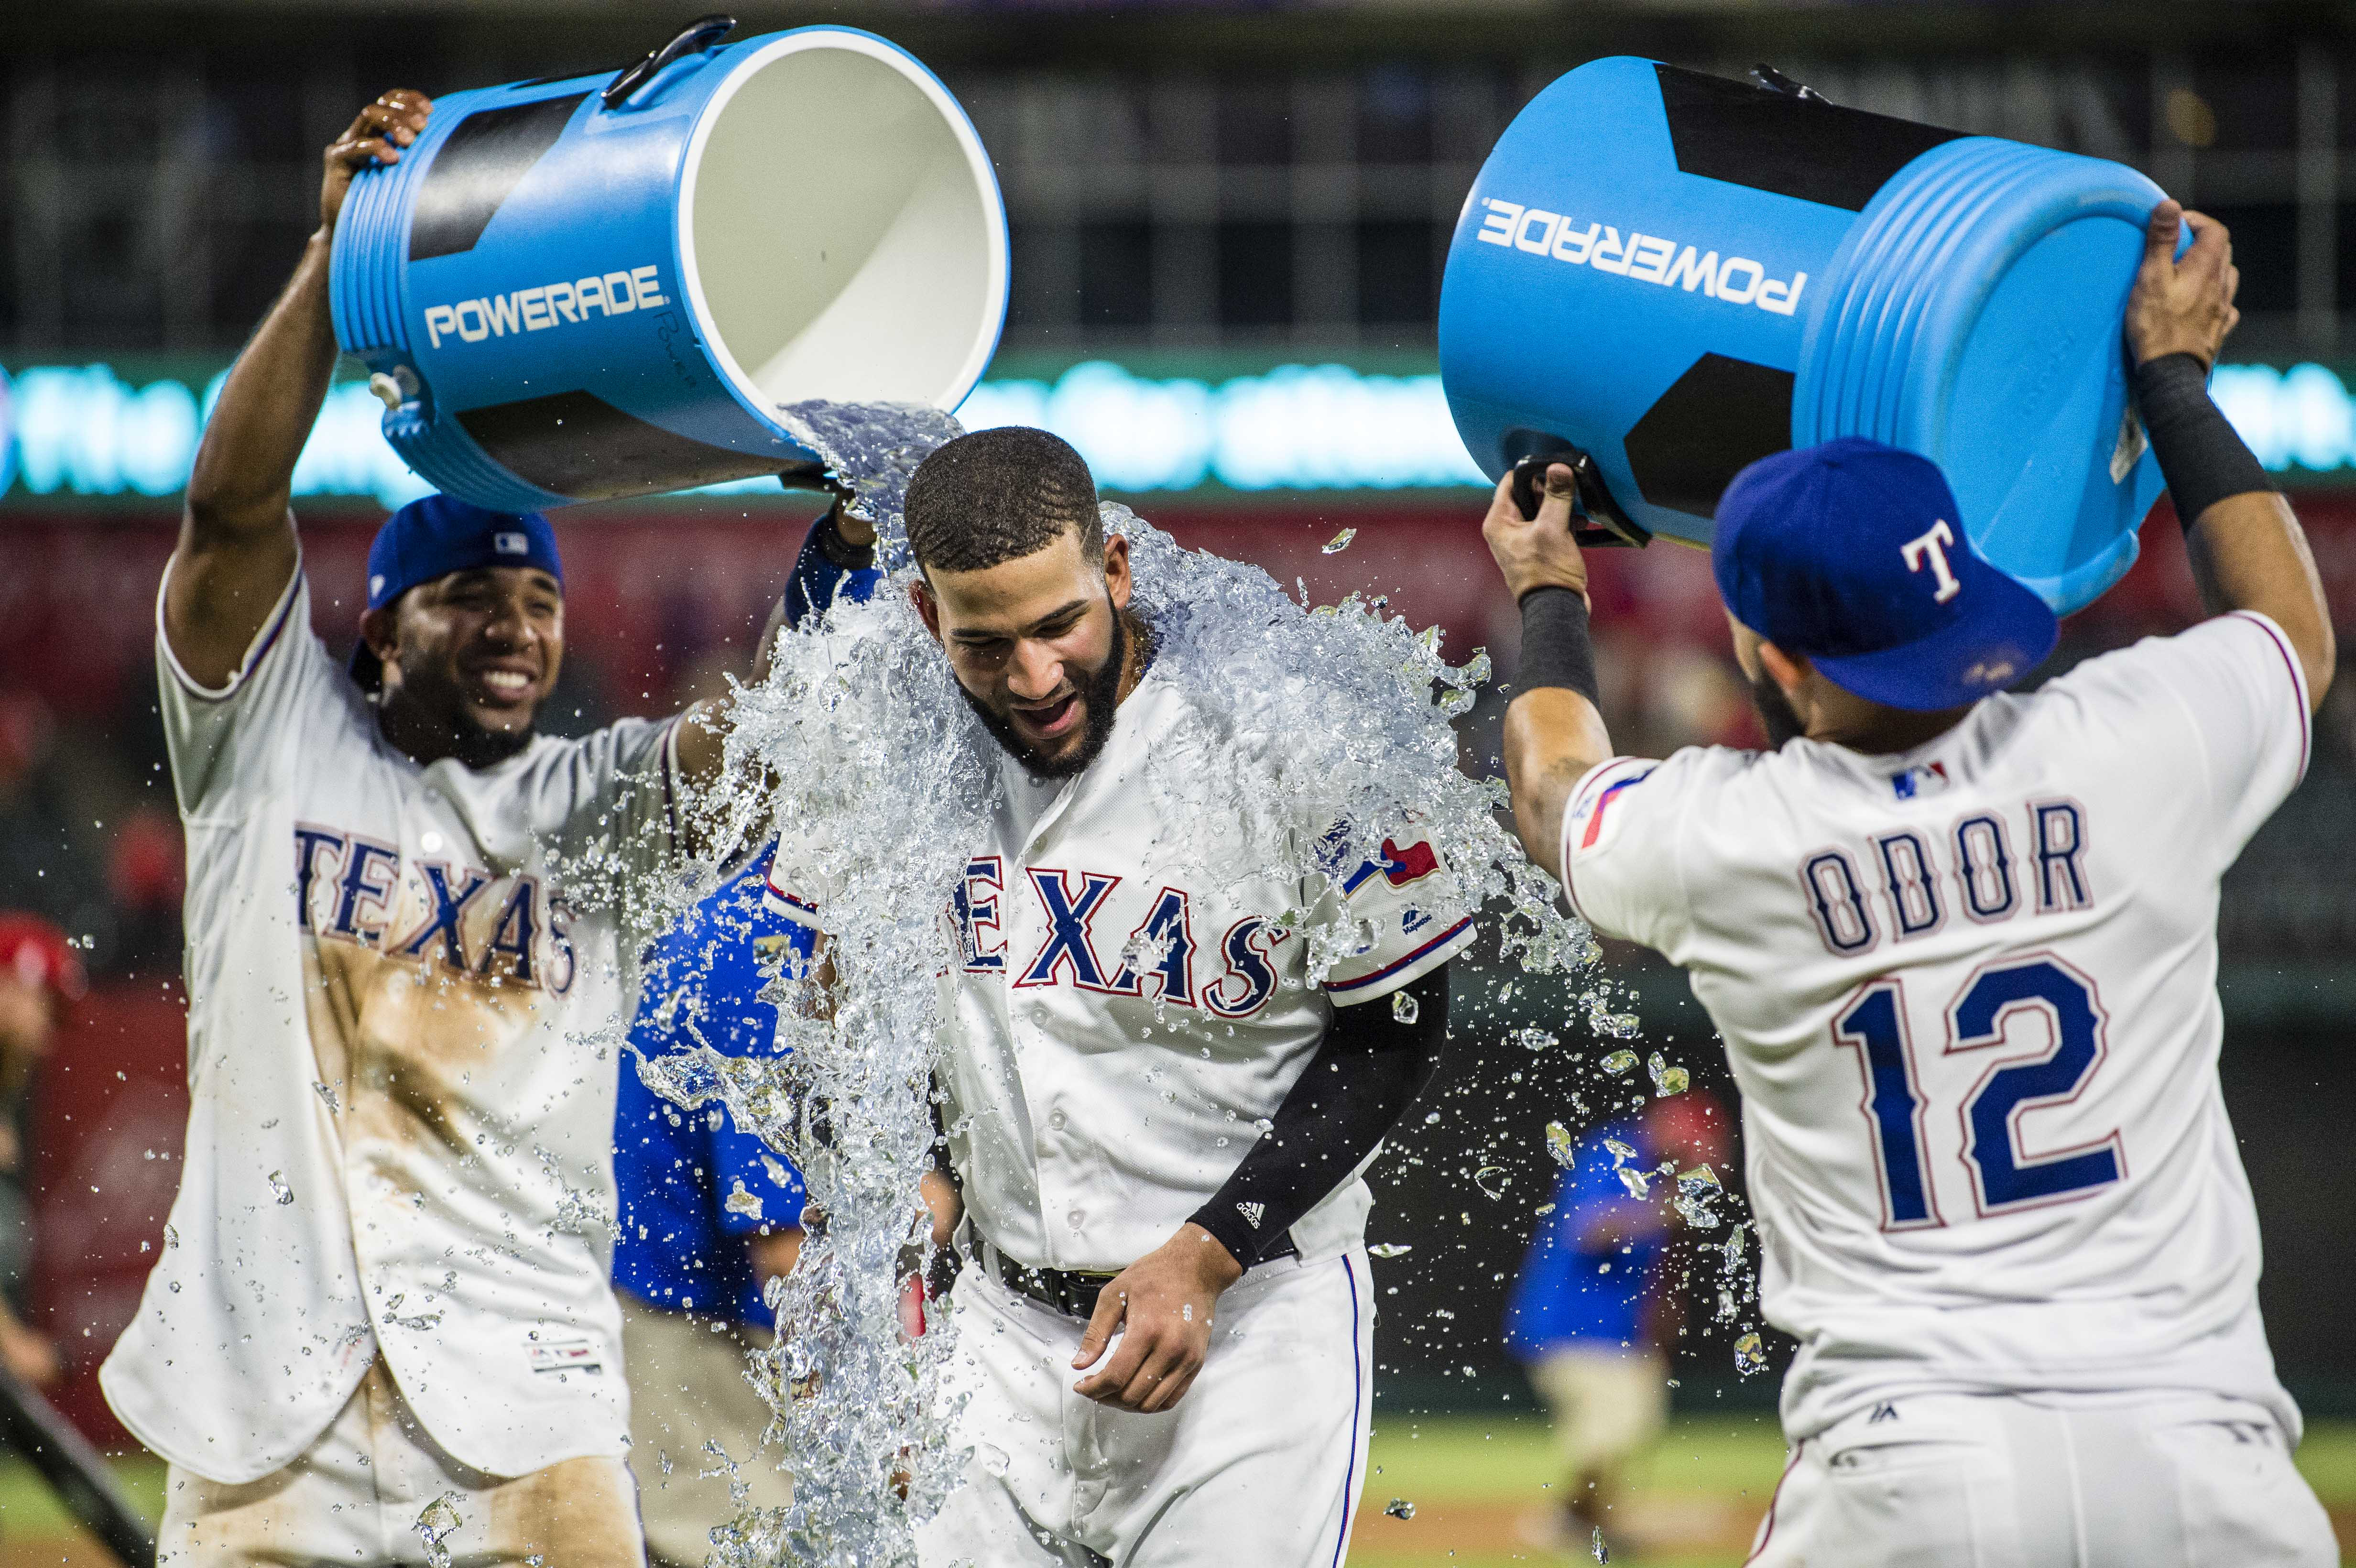 10123266-mlb-toronto-blue-jays-at-texas-rangers